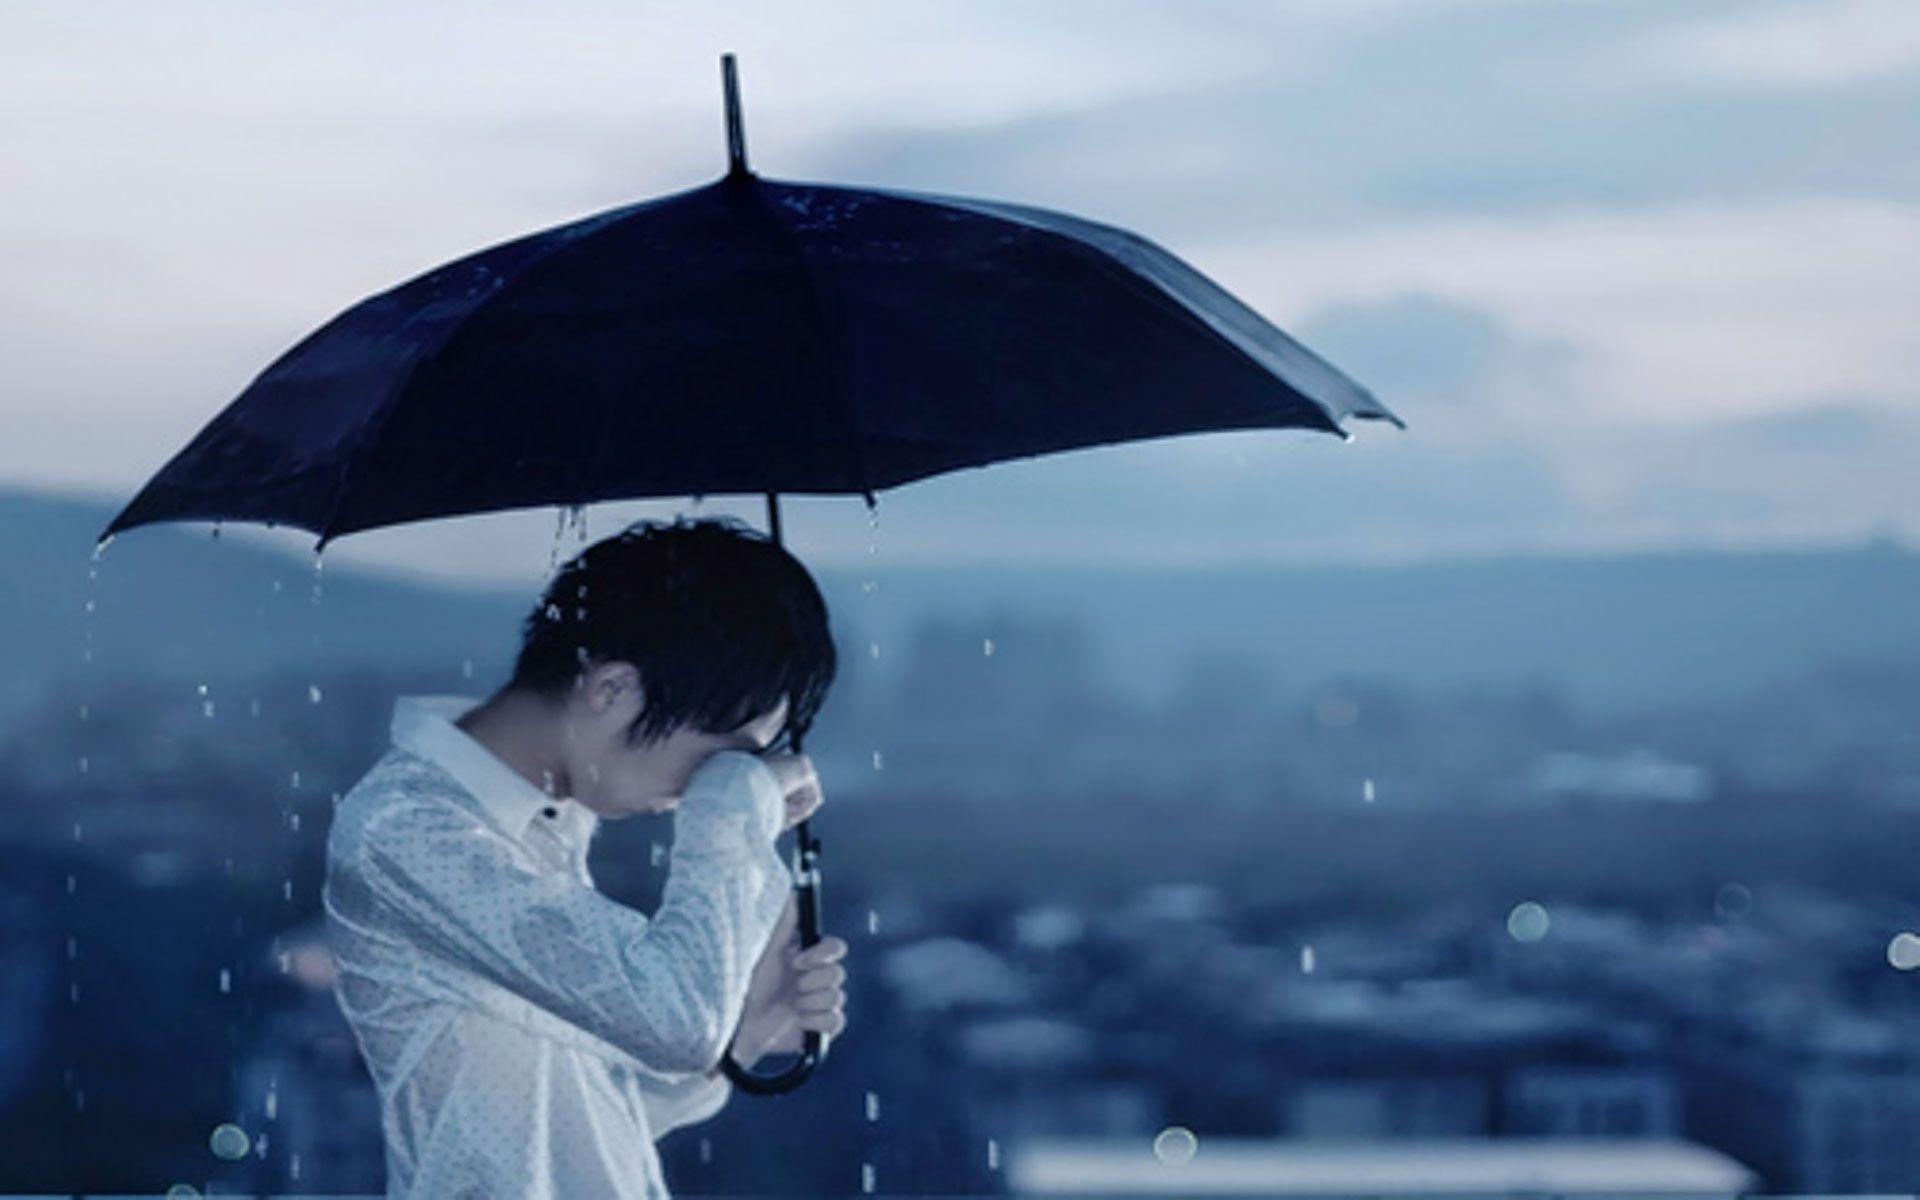 Sad Boy Alone In Rain Wallpapers Wallpaper Cave